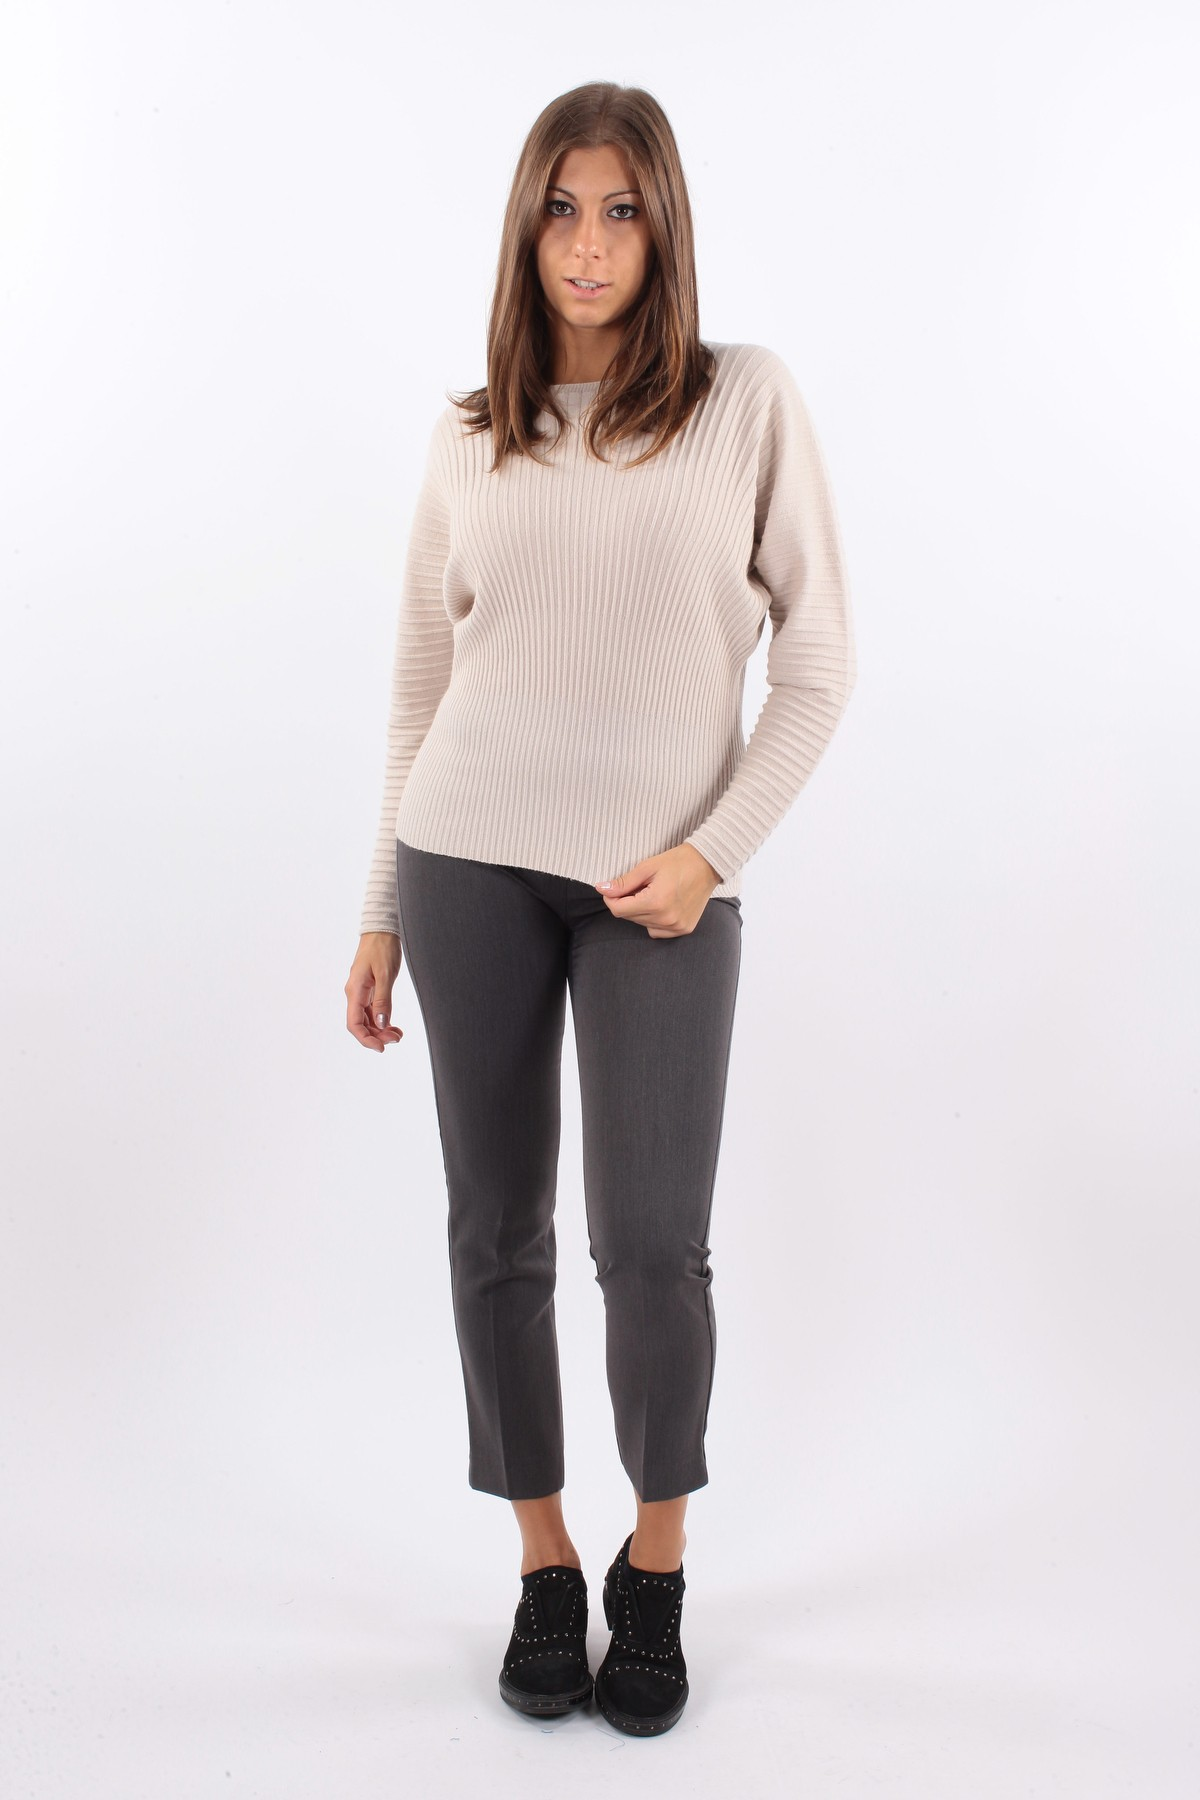 RIBBED VISCOSE SWEATER for women - CREAM - Paquito Pronto Moda Shop Online